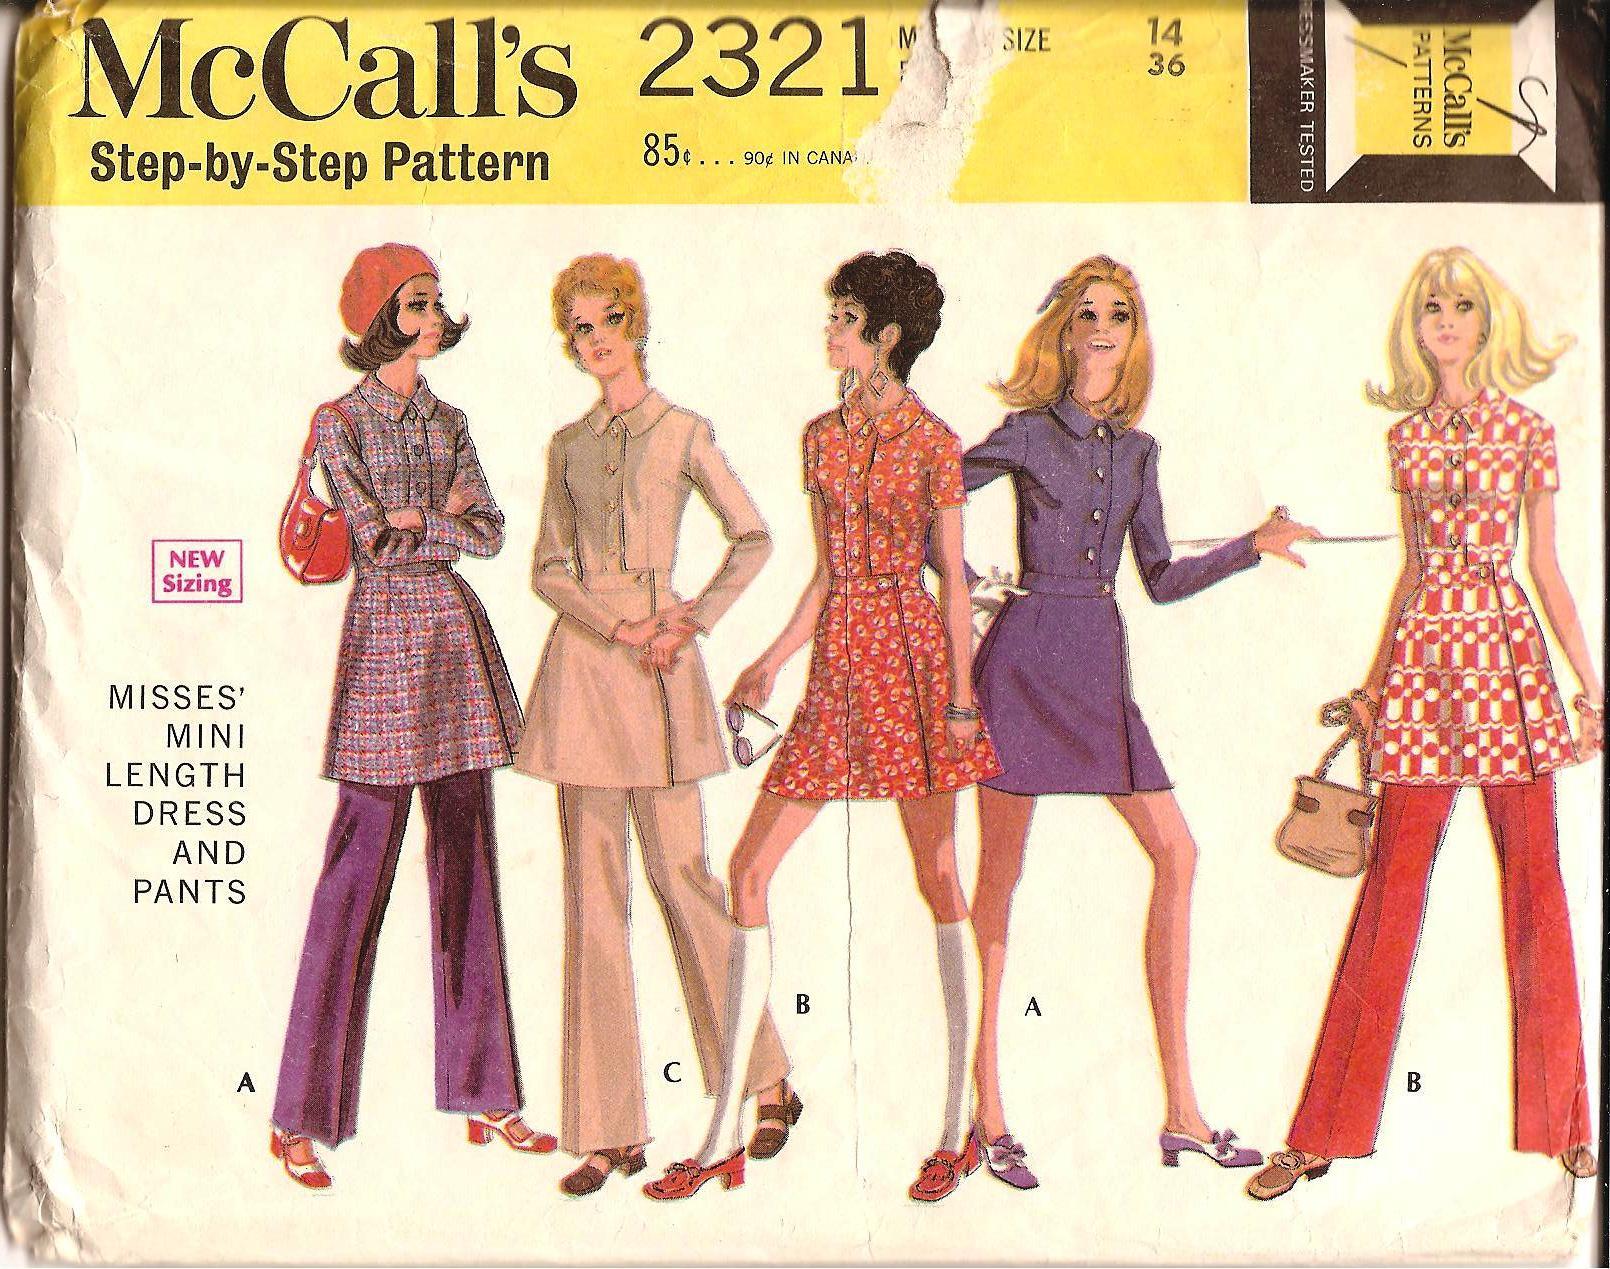 Mccalls 2321